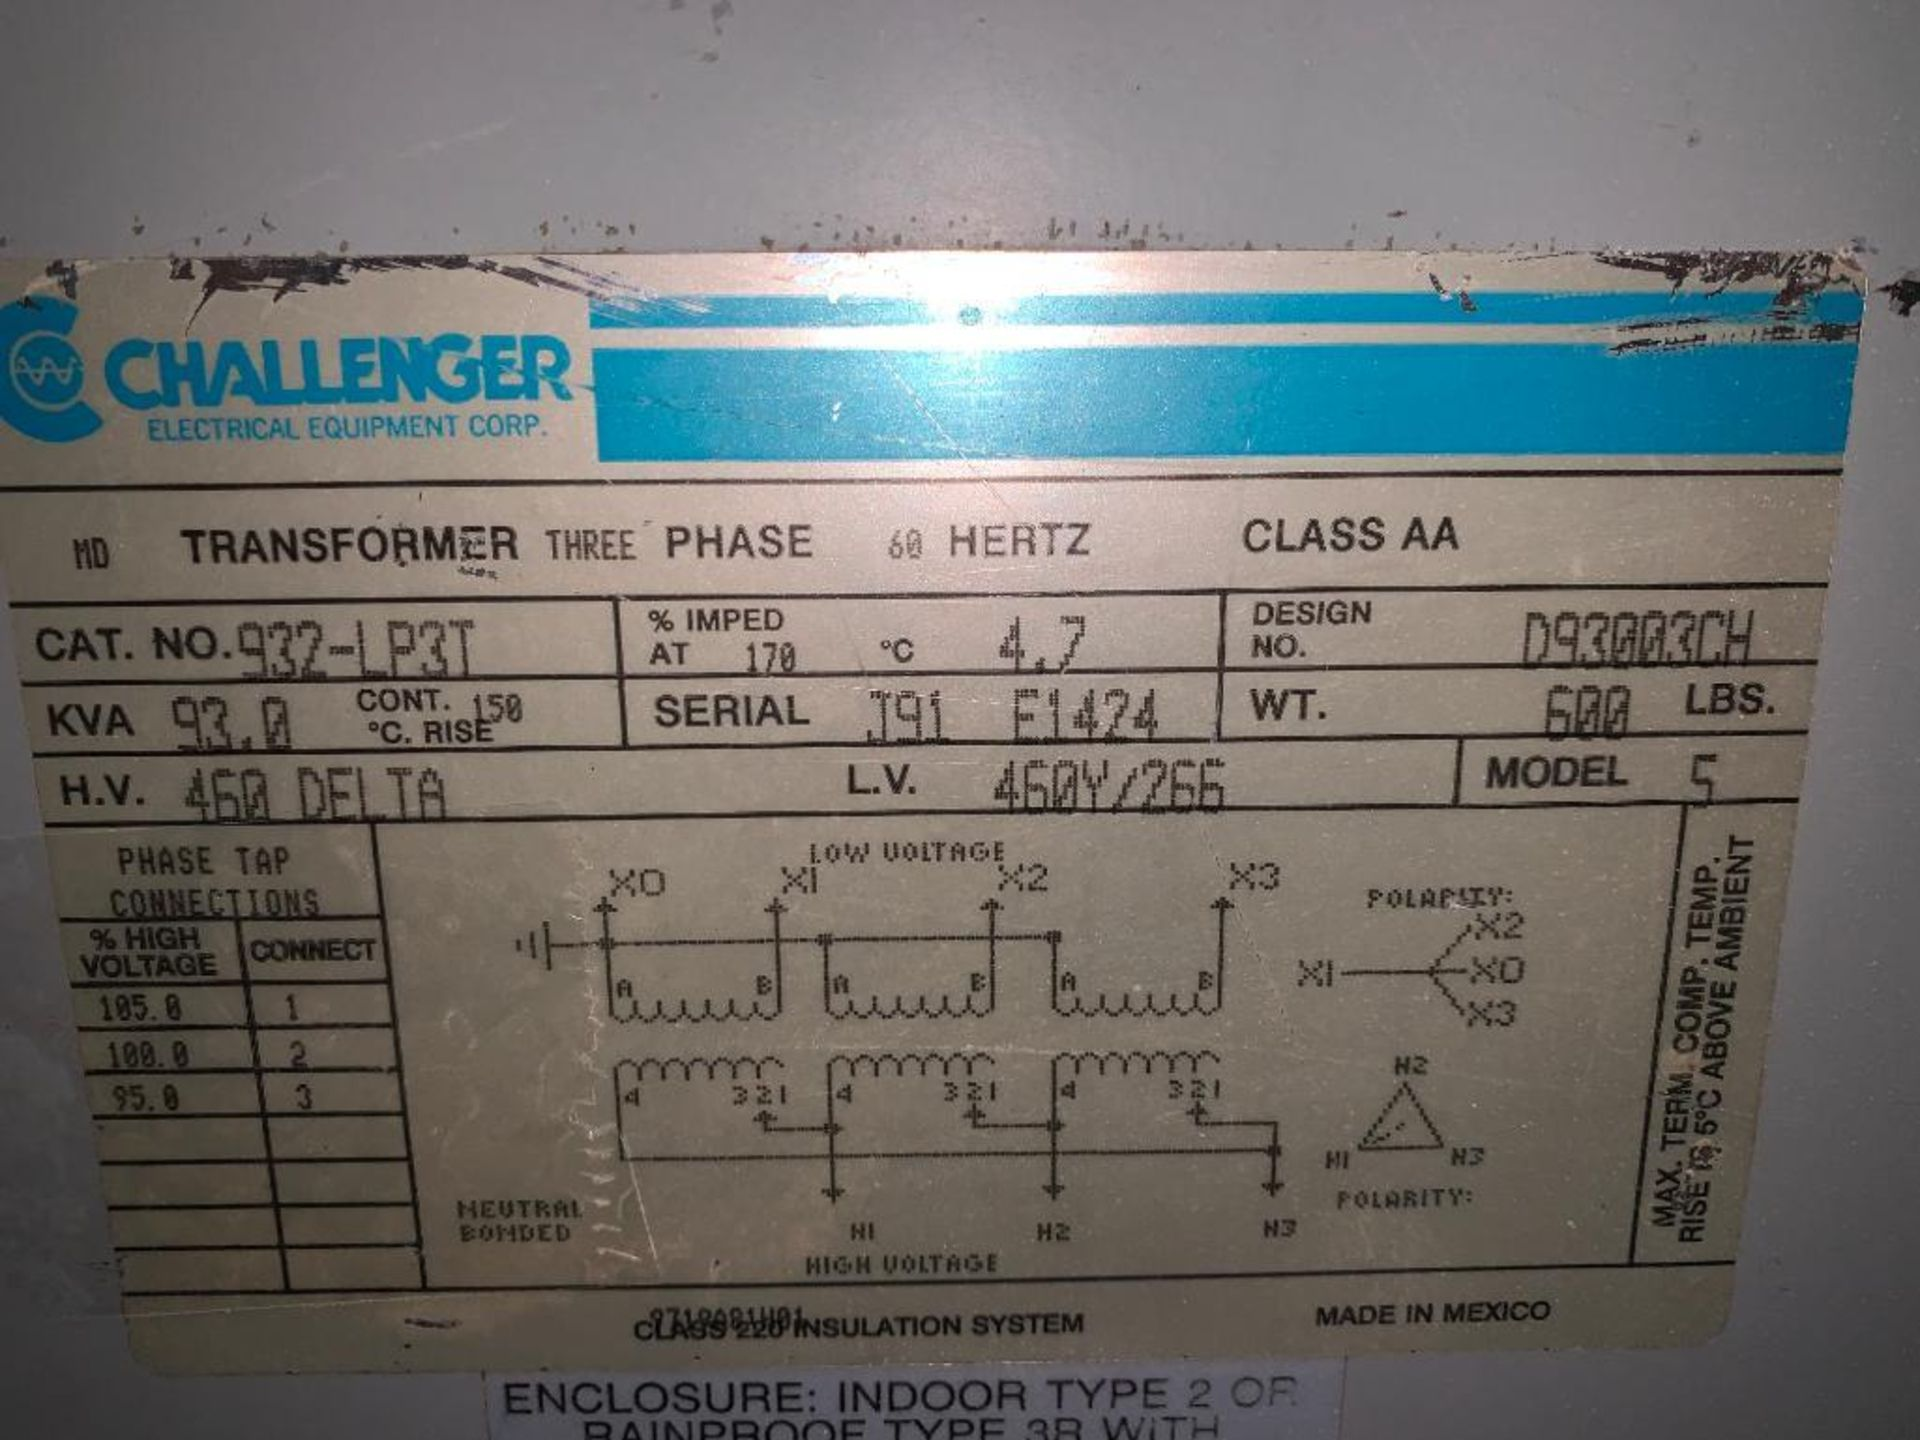 Challenger 93KVA transformer - Image 2 of 5